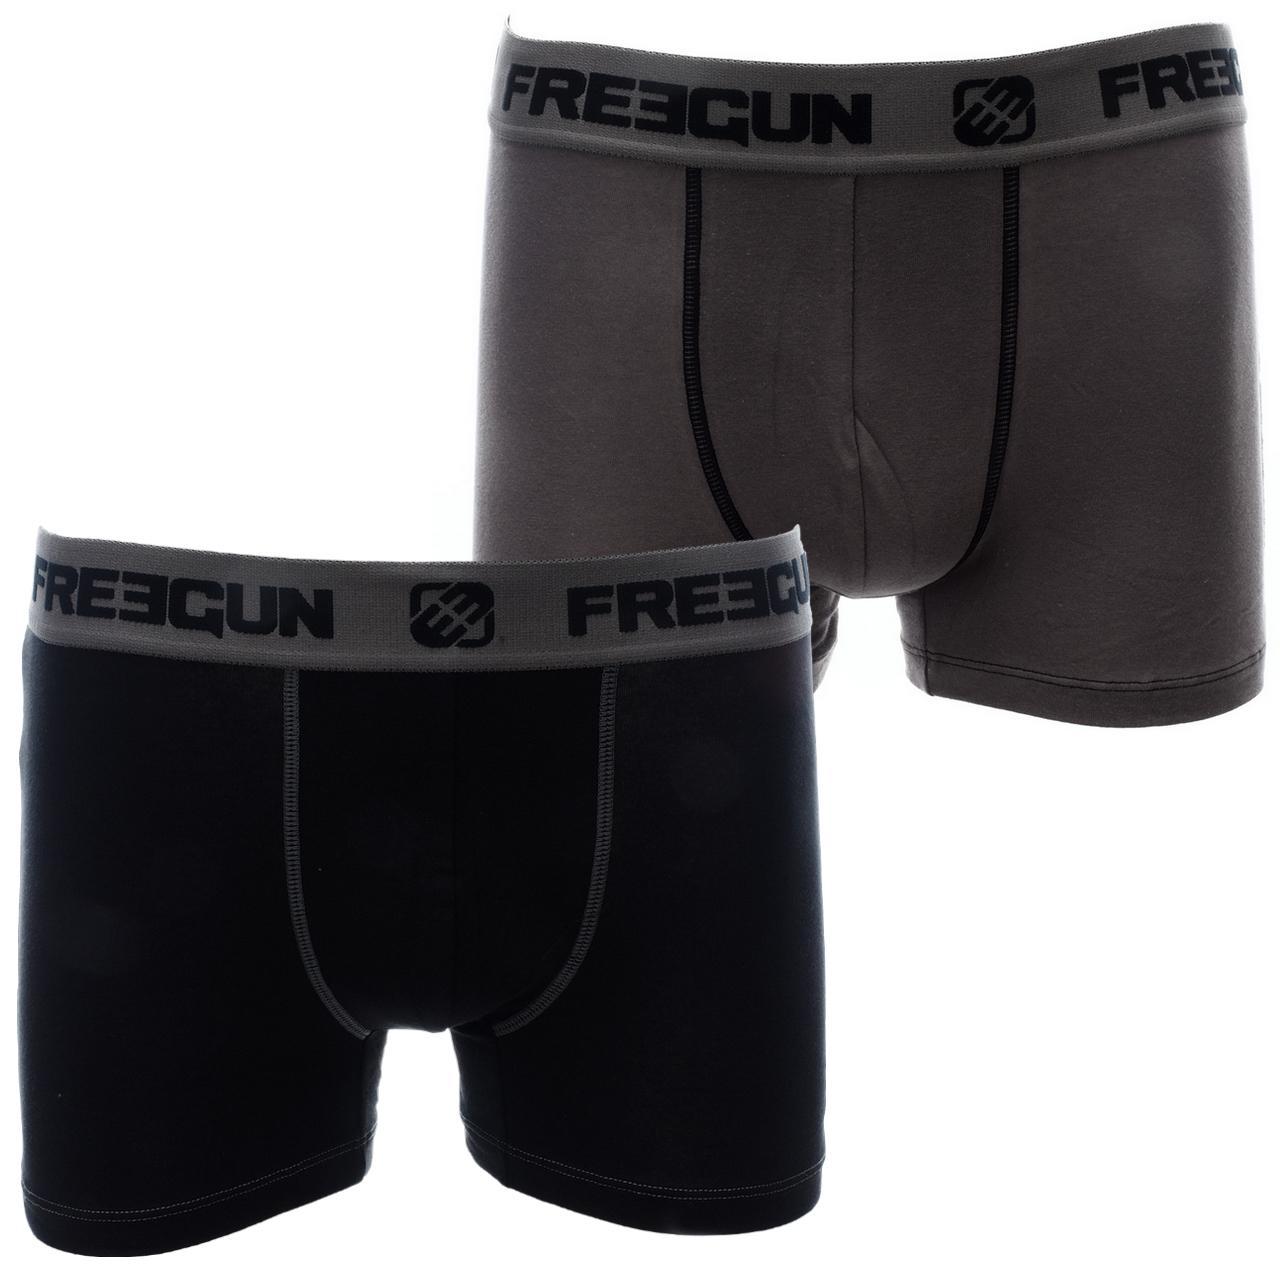 Underwear-Boxer-Freegun-Duo-J-Grey-Black-Boxer-Grey-26510-New